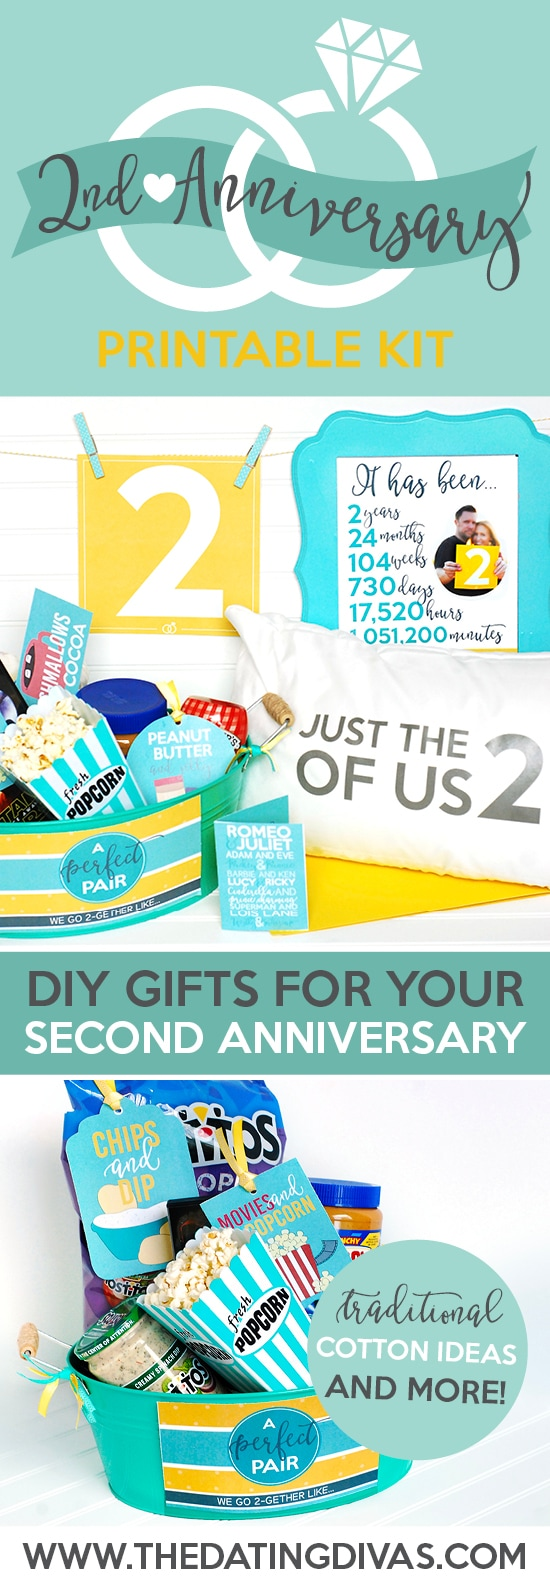 2aa002fba605 Second Anniversary Gift Printable Kit - The Dating Divas